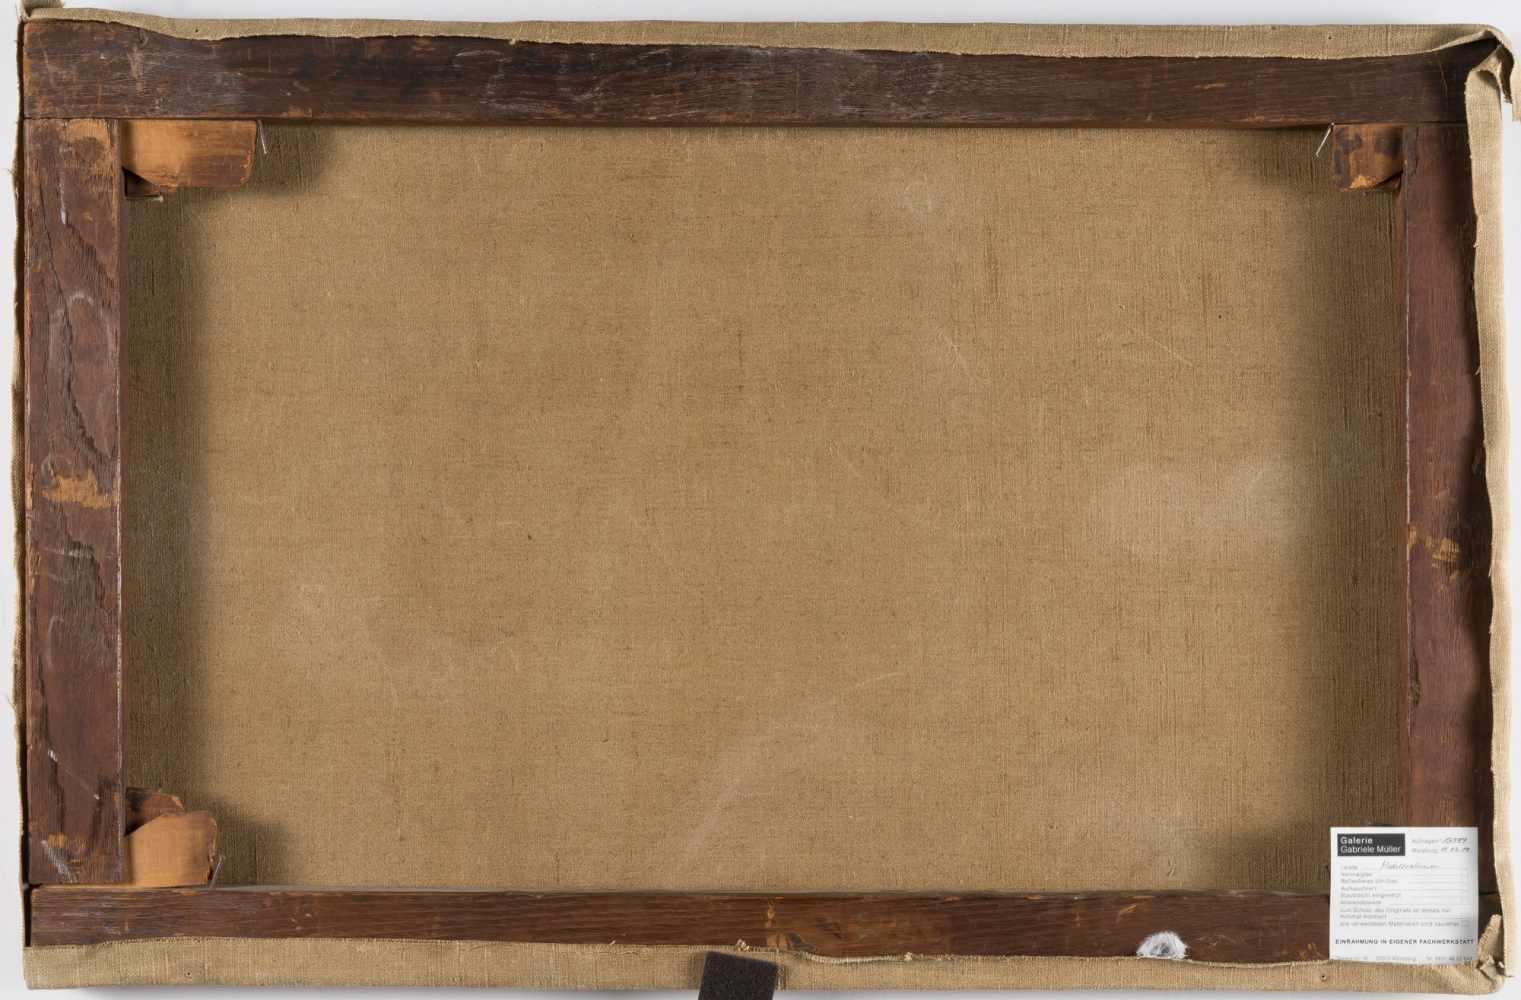 Lot 32 - Julius Schlegel1825 Potsdam – Berlin 1884Blick auf SorrentÖl auf Leinwand, doubliert. (1854). 42 x